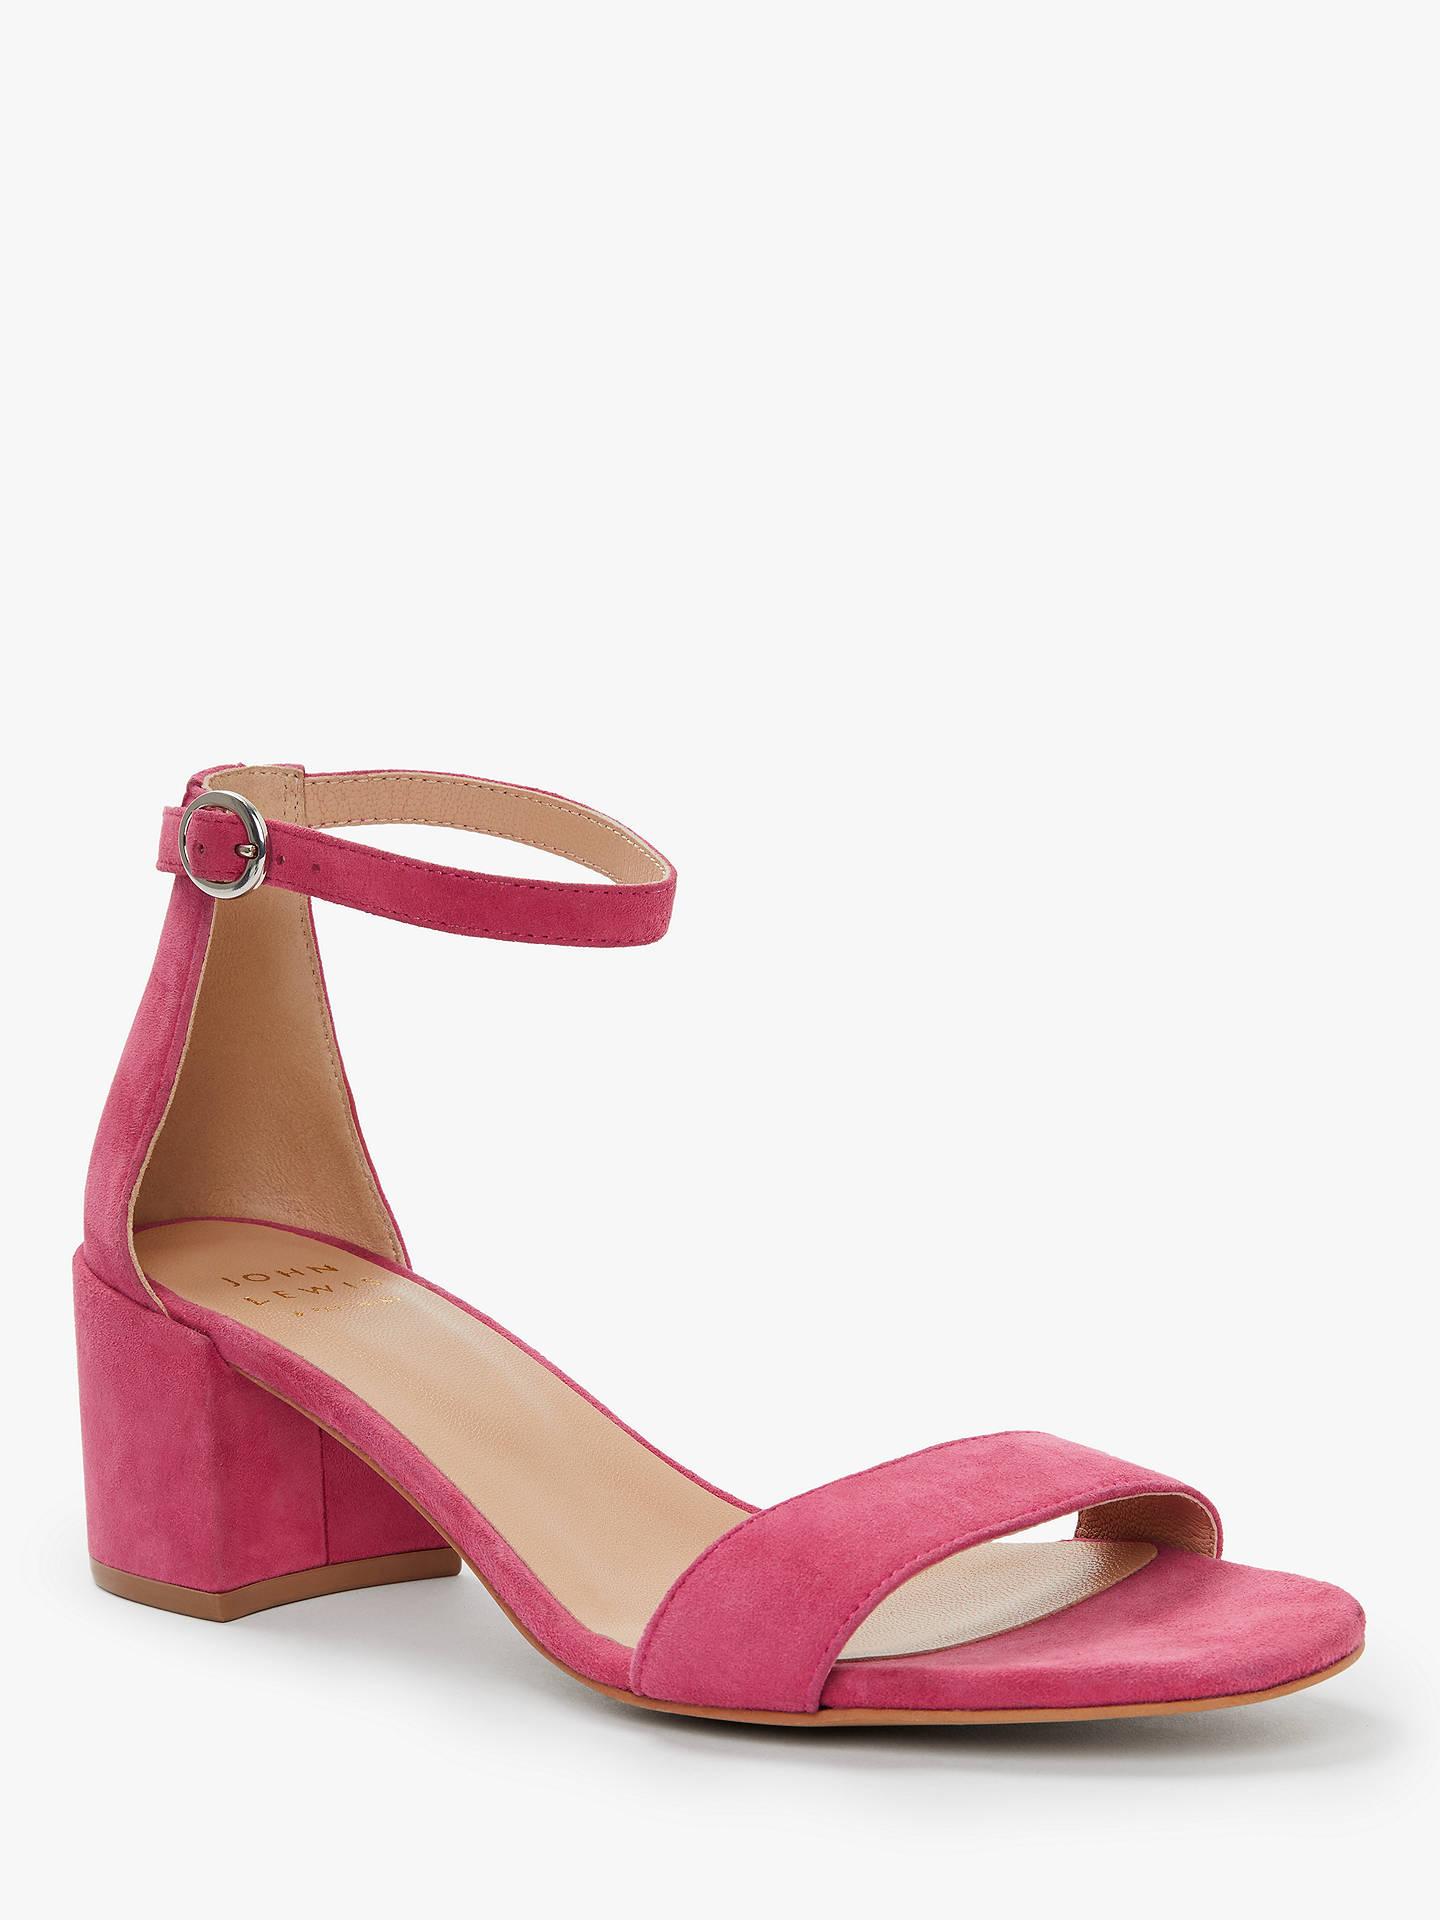 8bbe3461173 John Lewis & Partners Clea Ankle Strap Block Heel Sandals at John ...